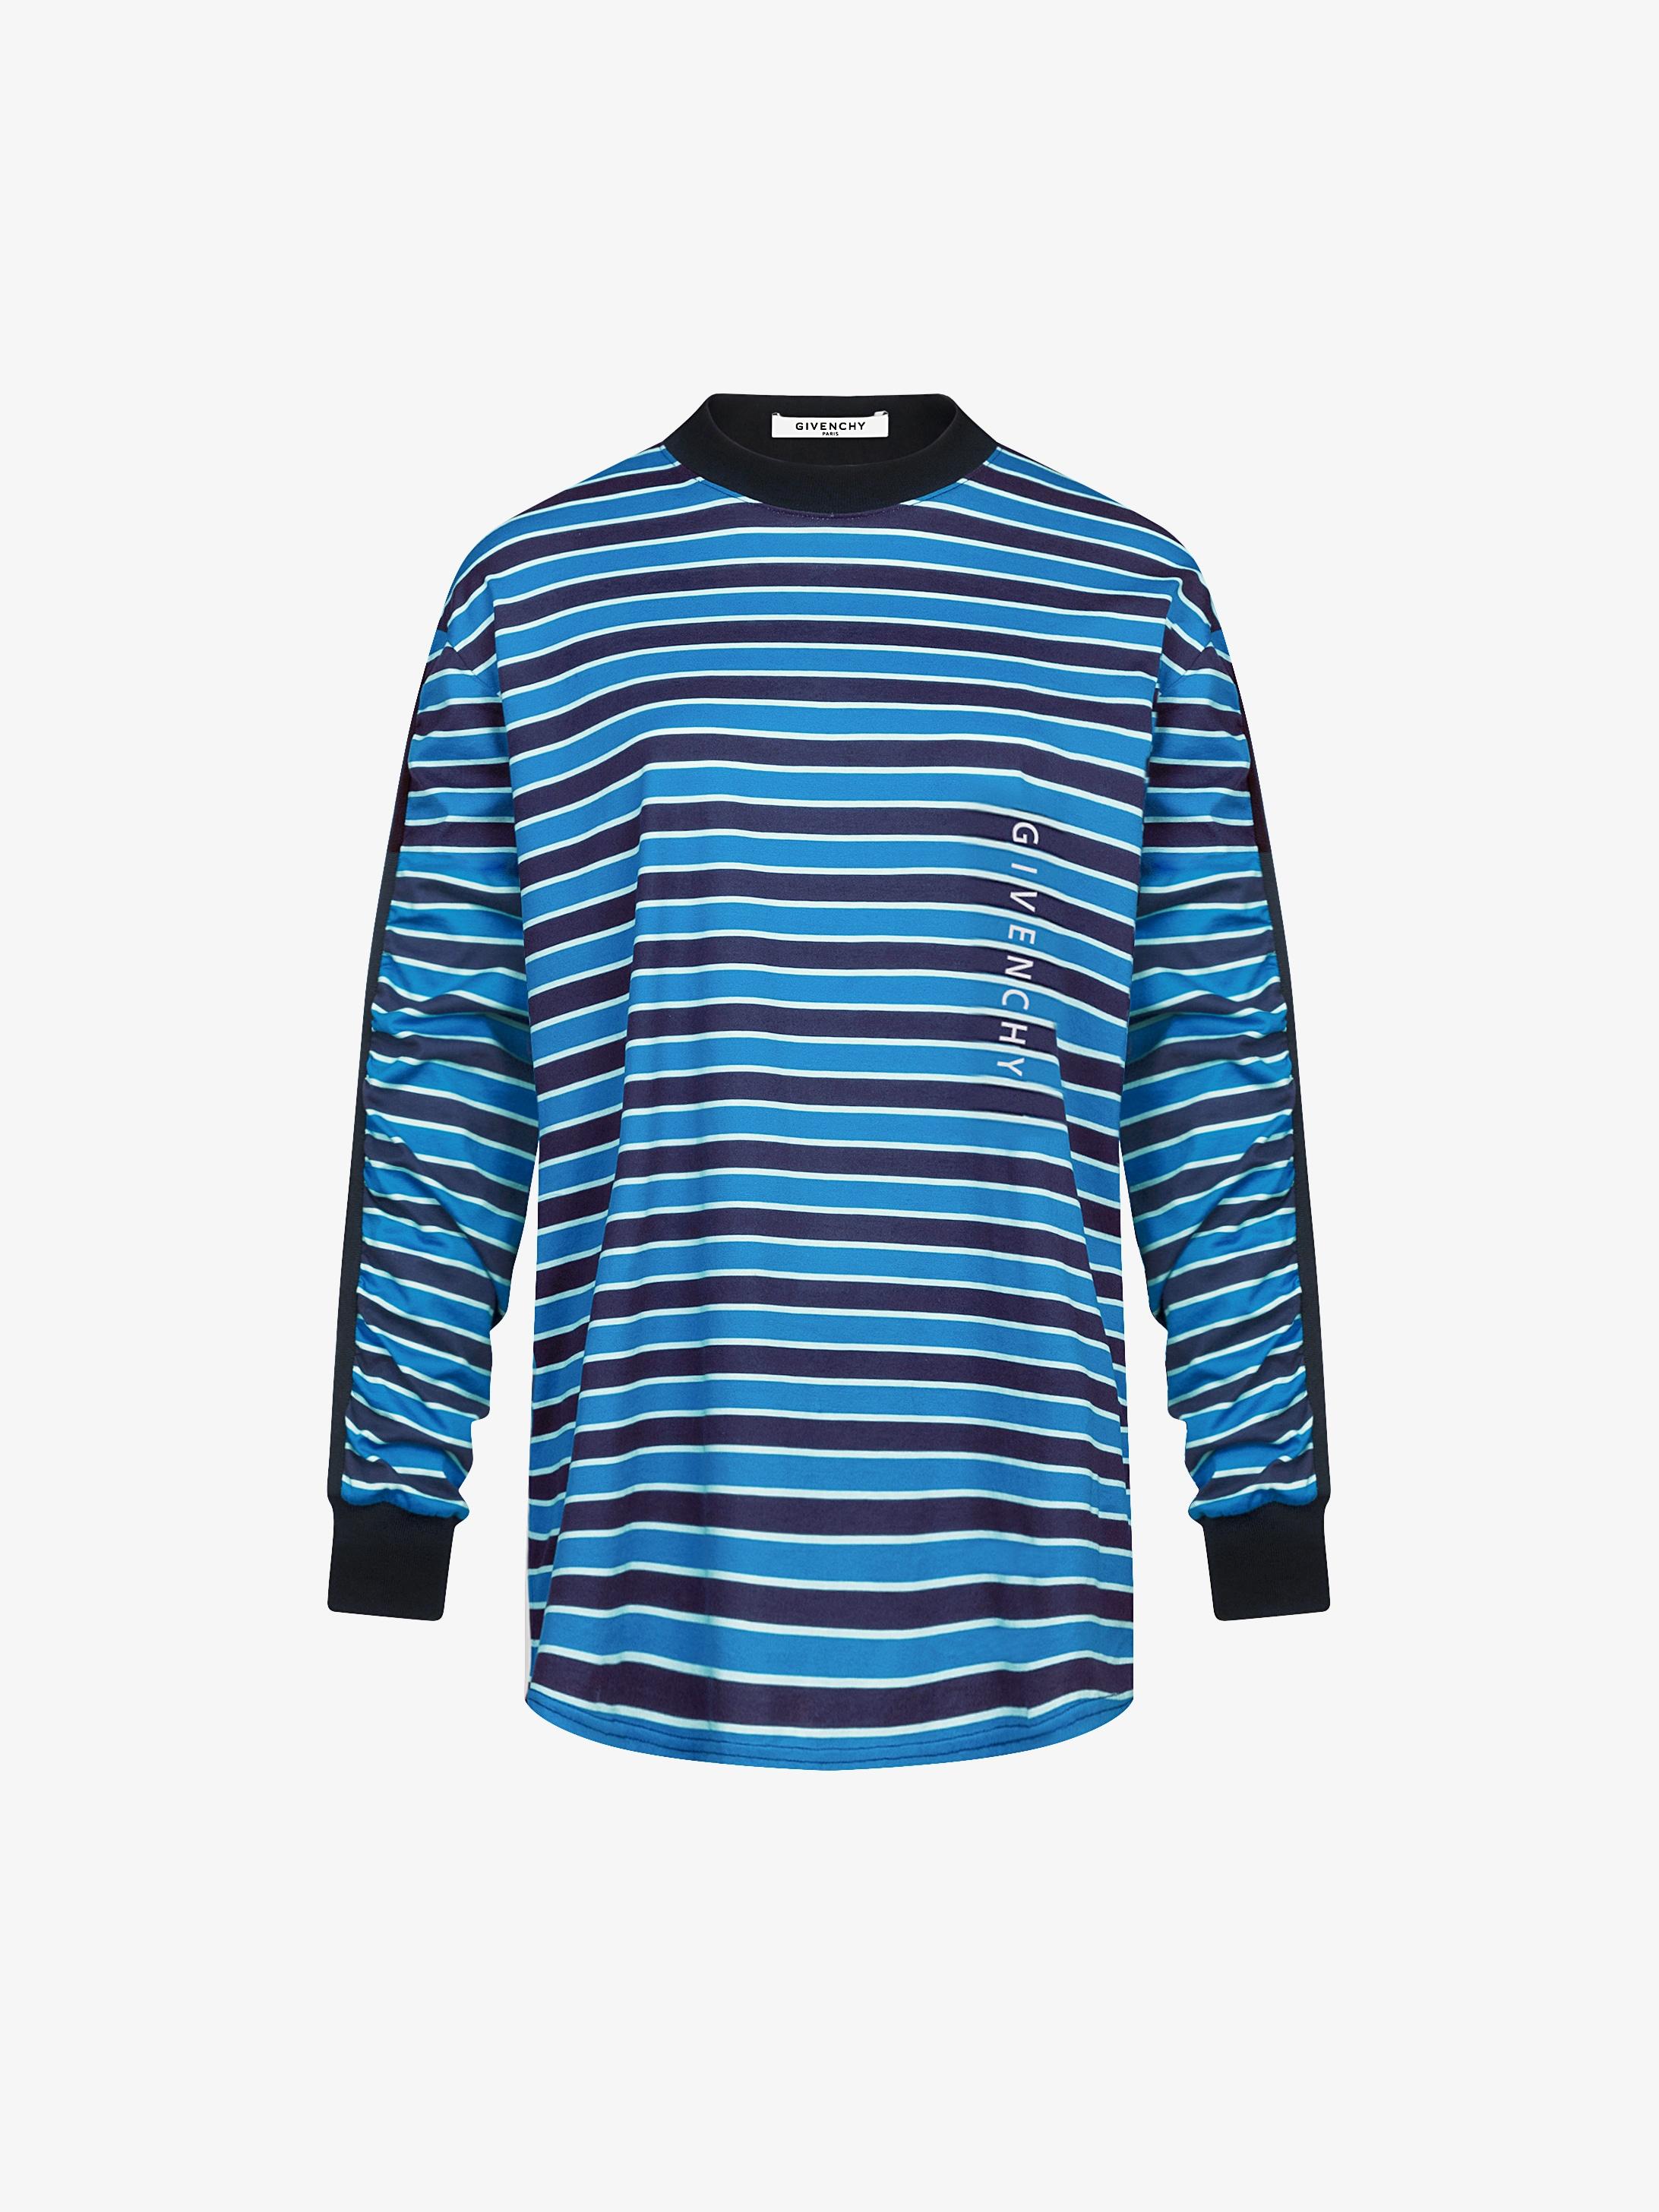 GIVENCHY stripes long sleeves sweatshirt